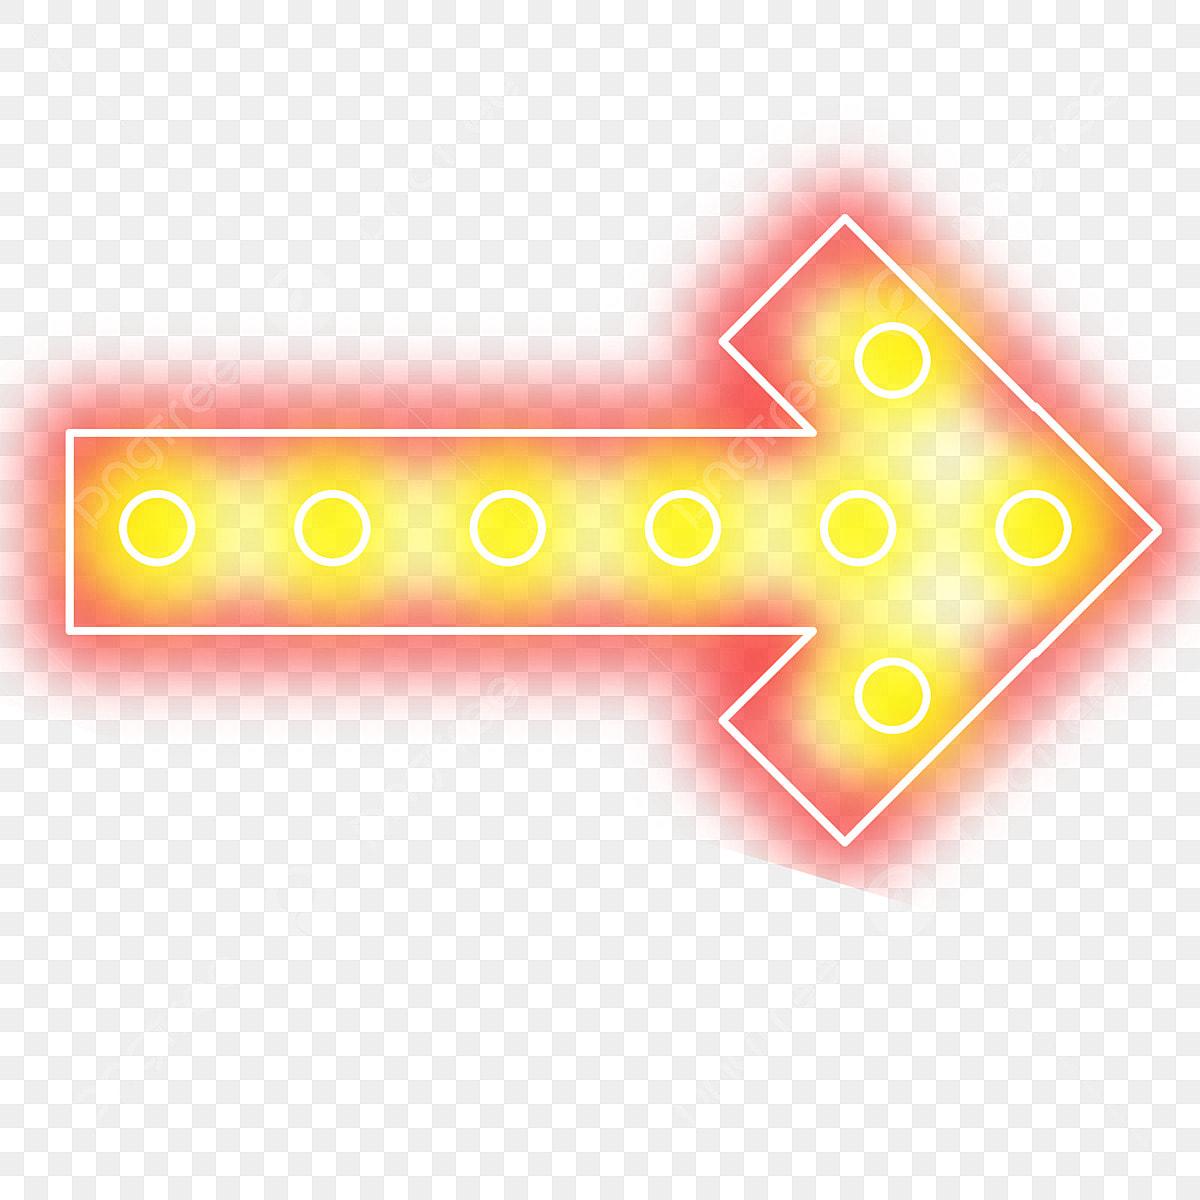 Christmas Arrow Png.Christmas Neon Lamp Illuminate Glare Arrow Direction Png